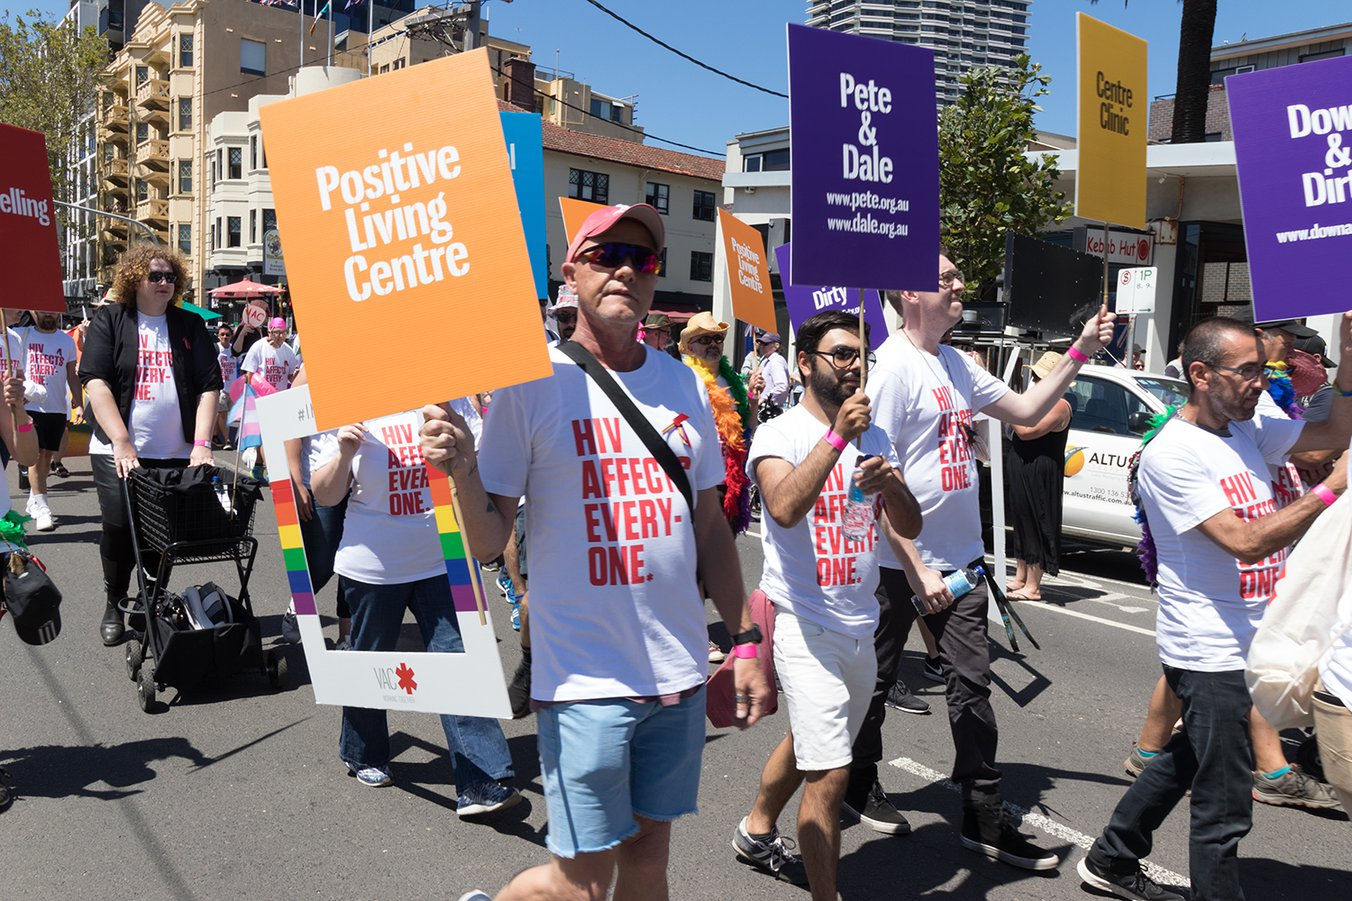 20170202_Pride March_Paul Rees_RE-SIZED_024.jpg